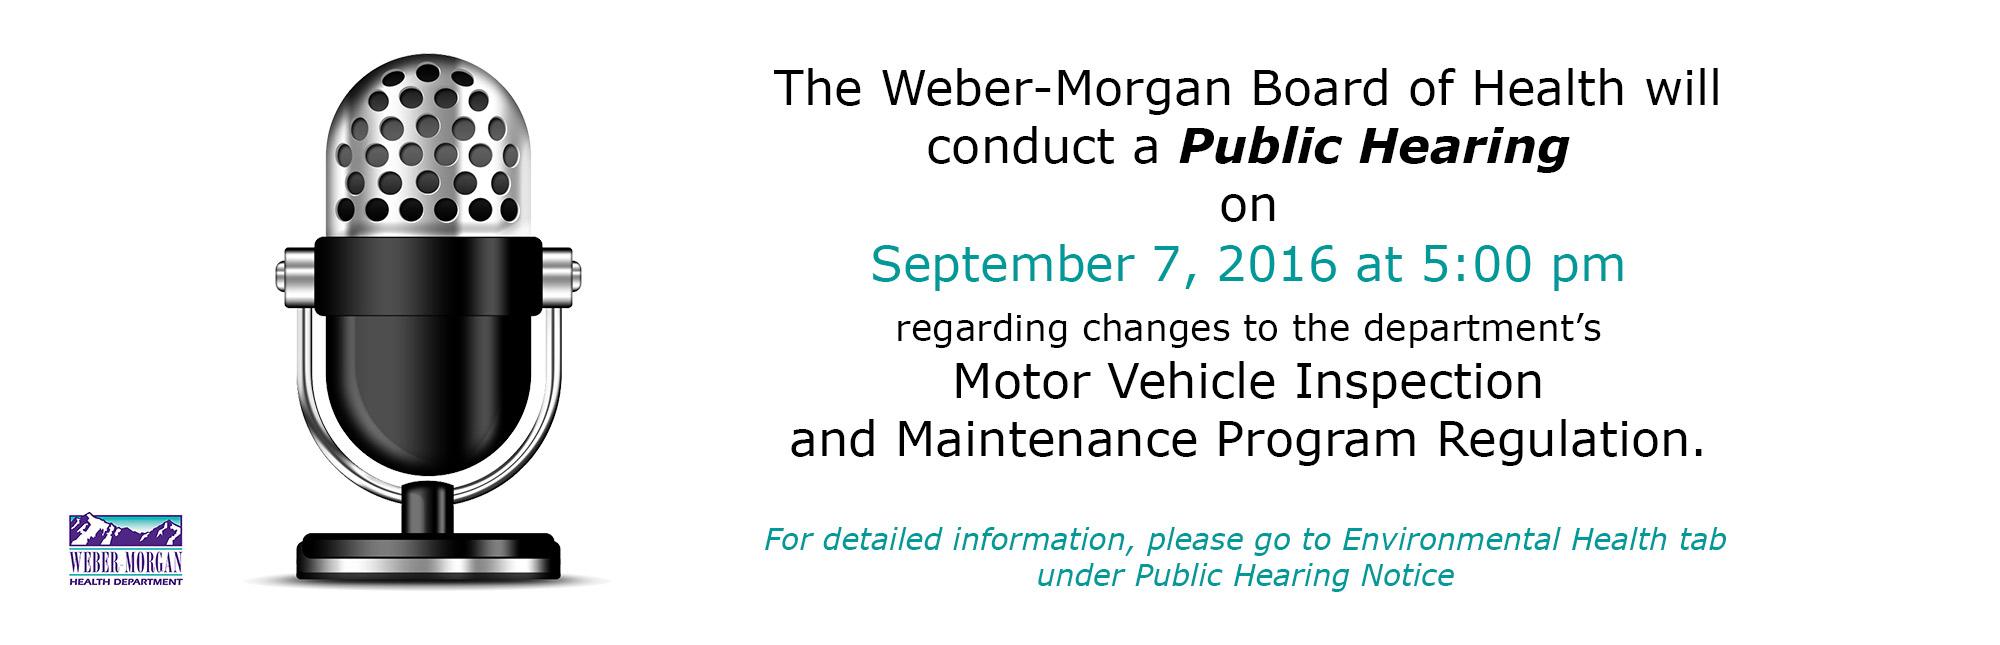 Public Hearing on Diesel Testing